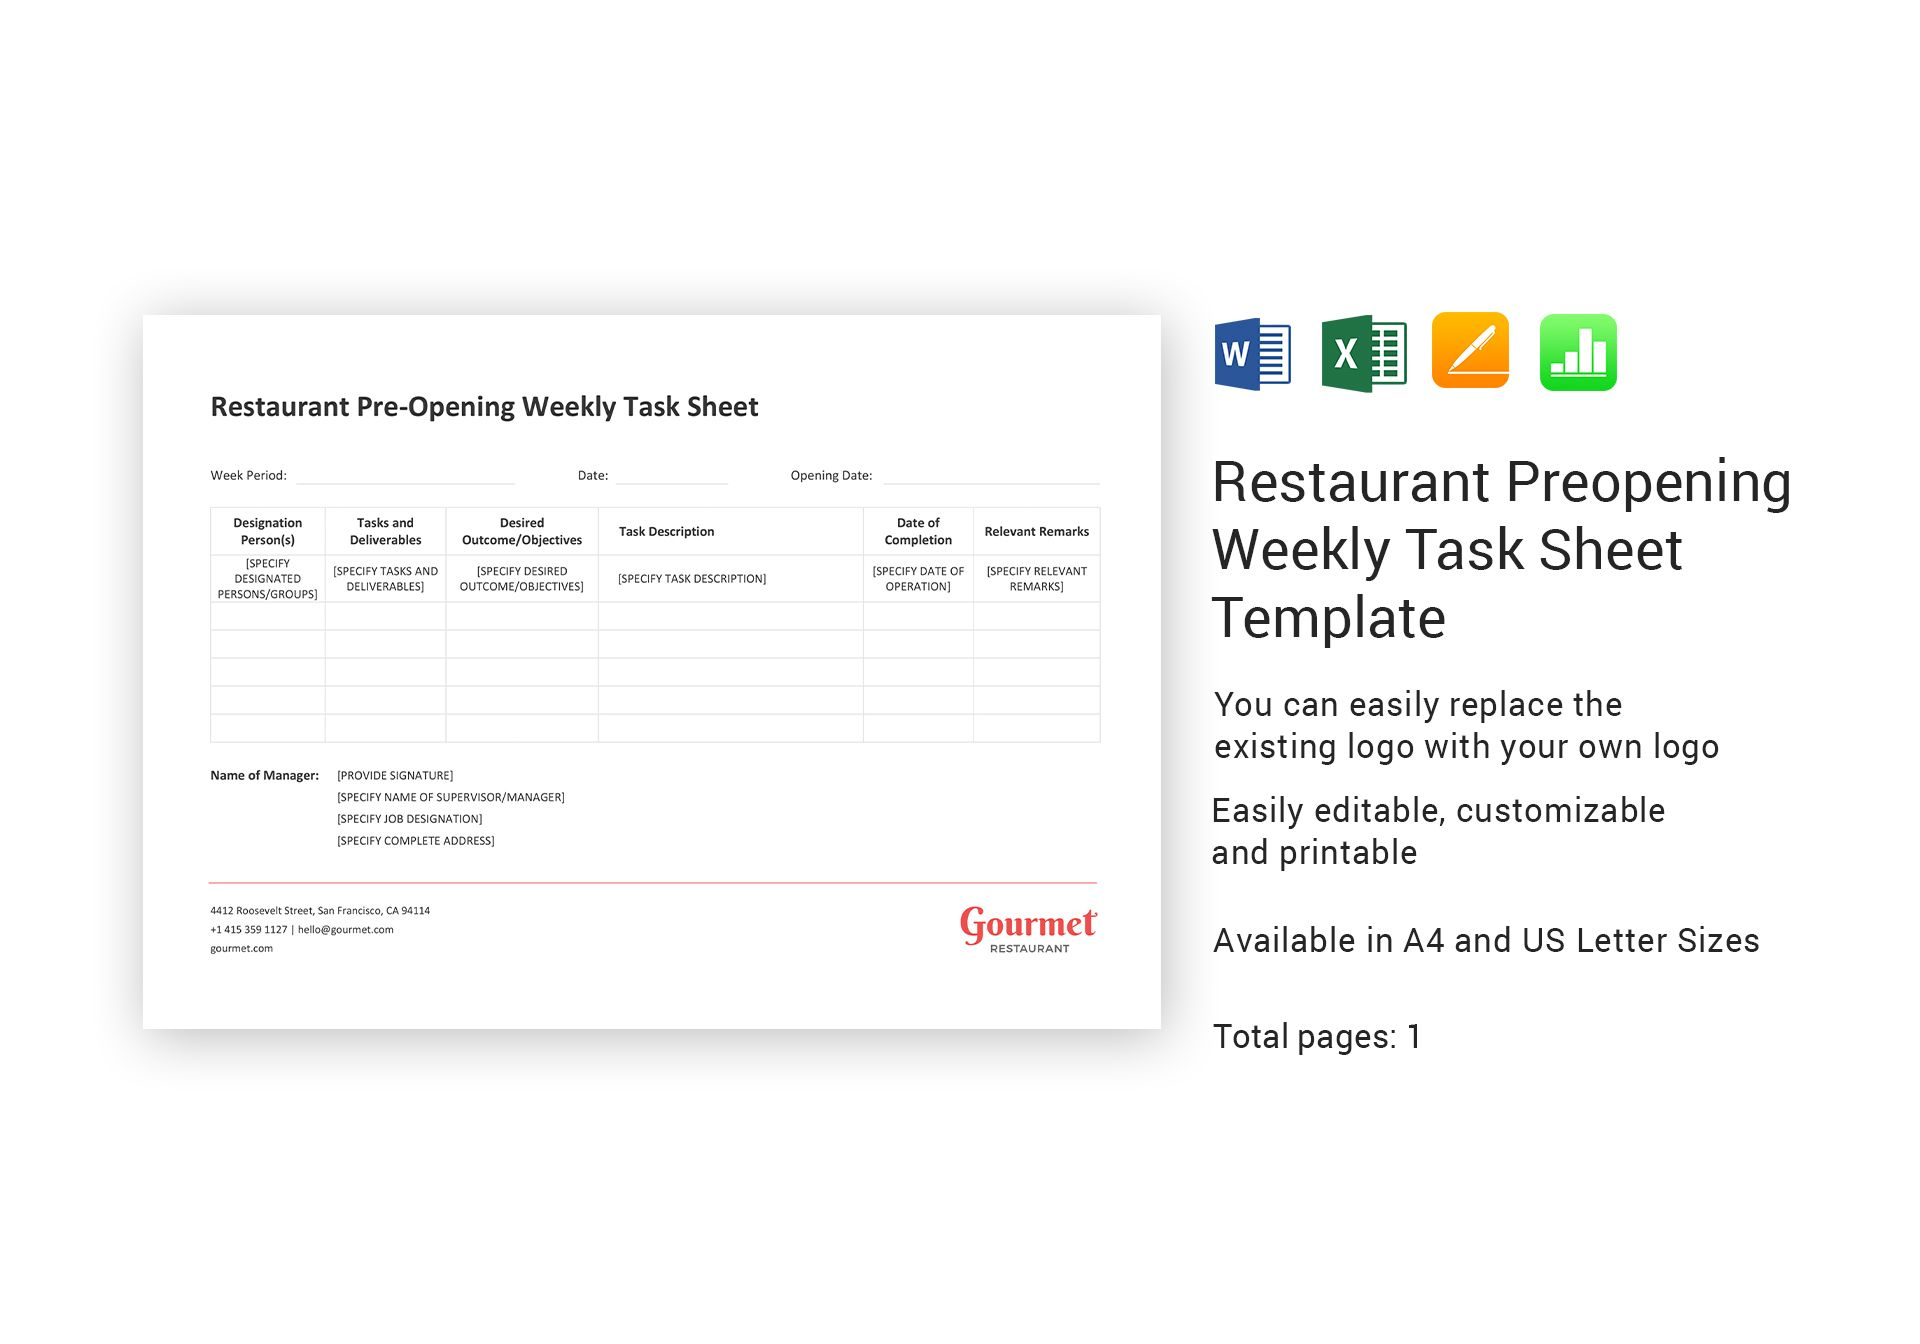 Restaurant Preopening Weekly Task Sheet